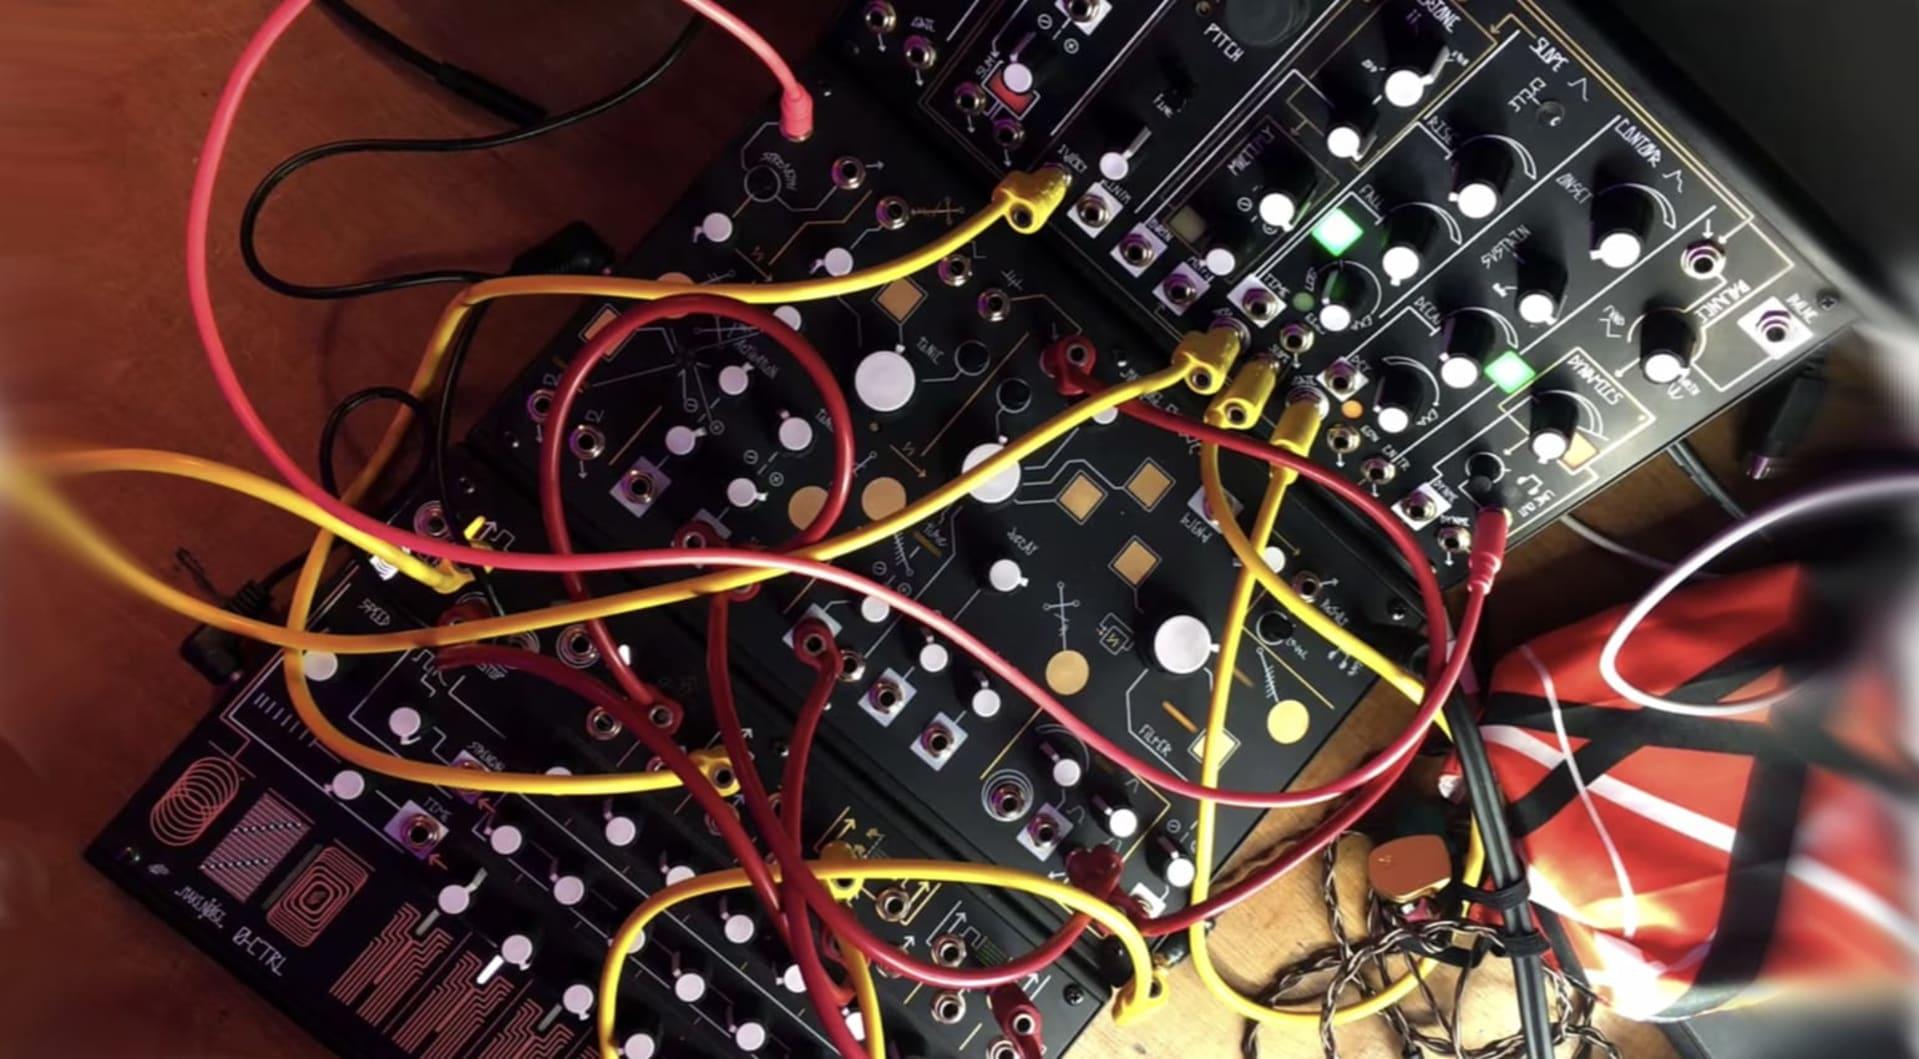 Make Noise - Strega